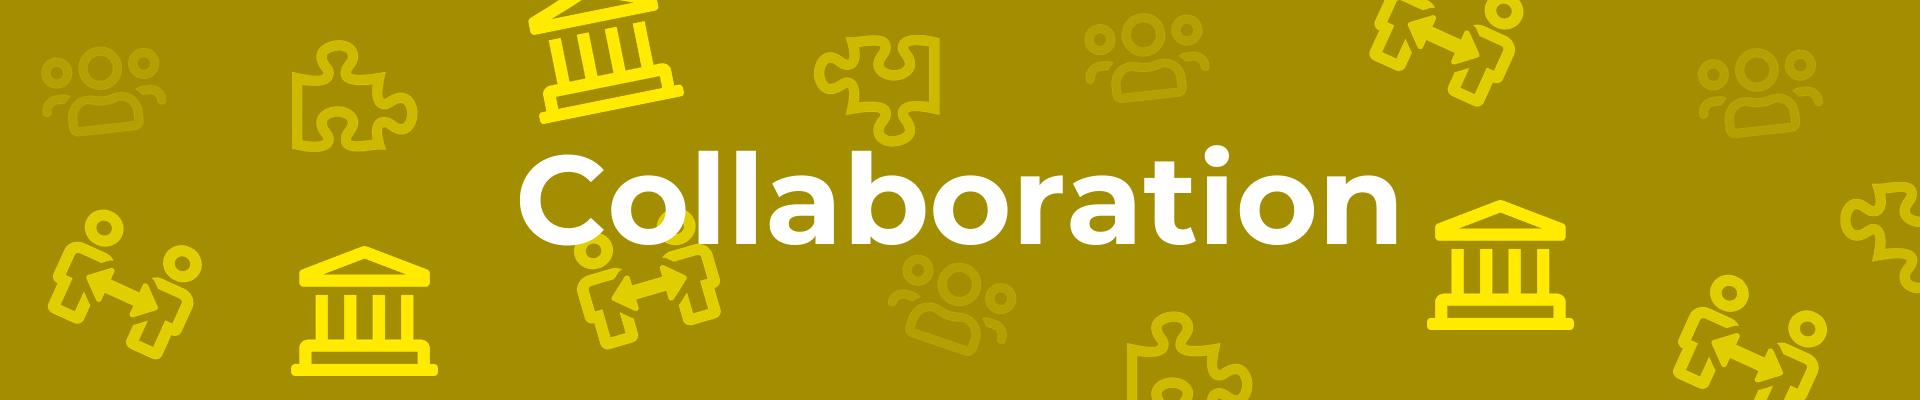 Collaboration Header